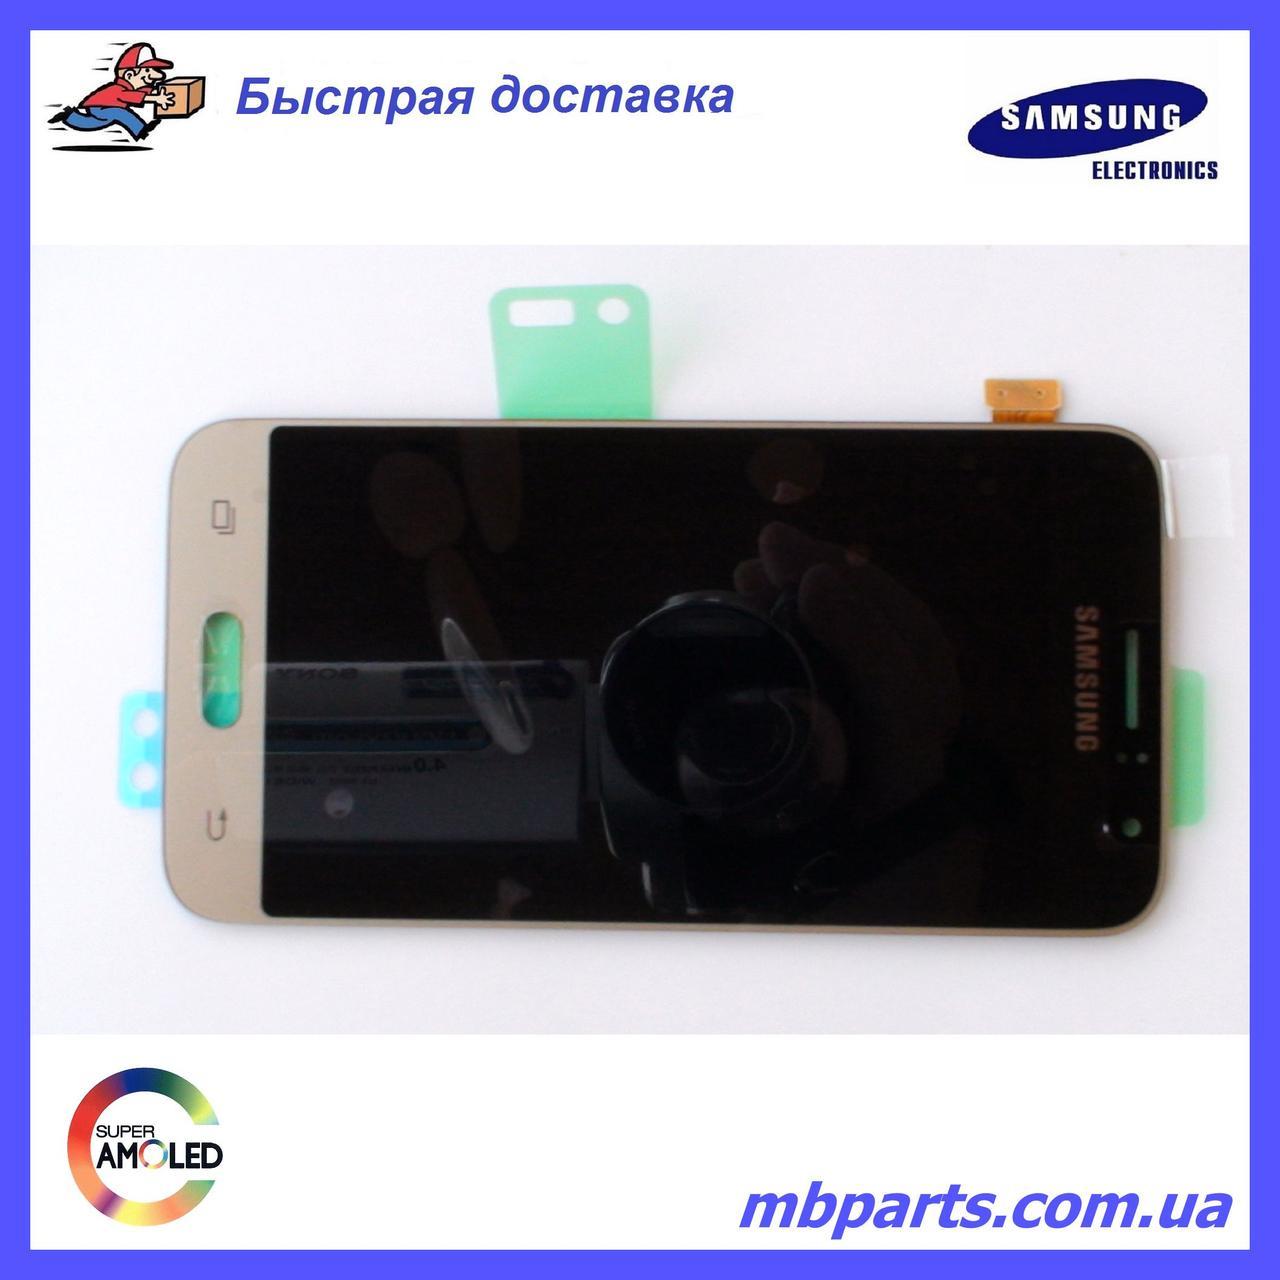 Дисплей с сенсором Samsung J120 Galaxy J1 Gold оригинал, GH97-18224B